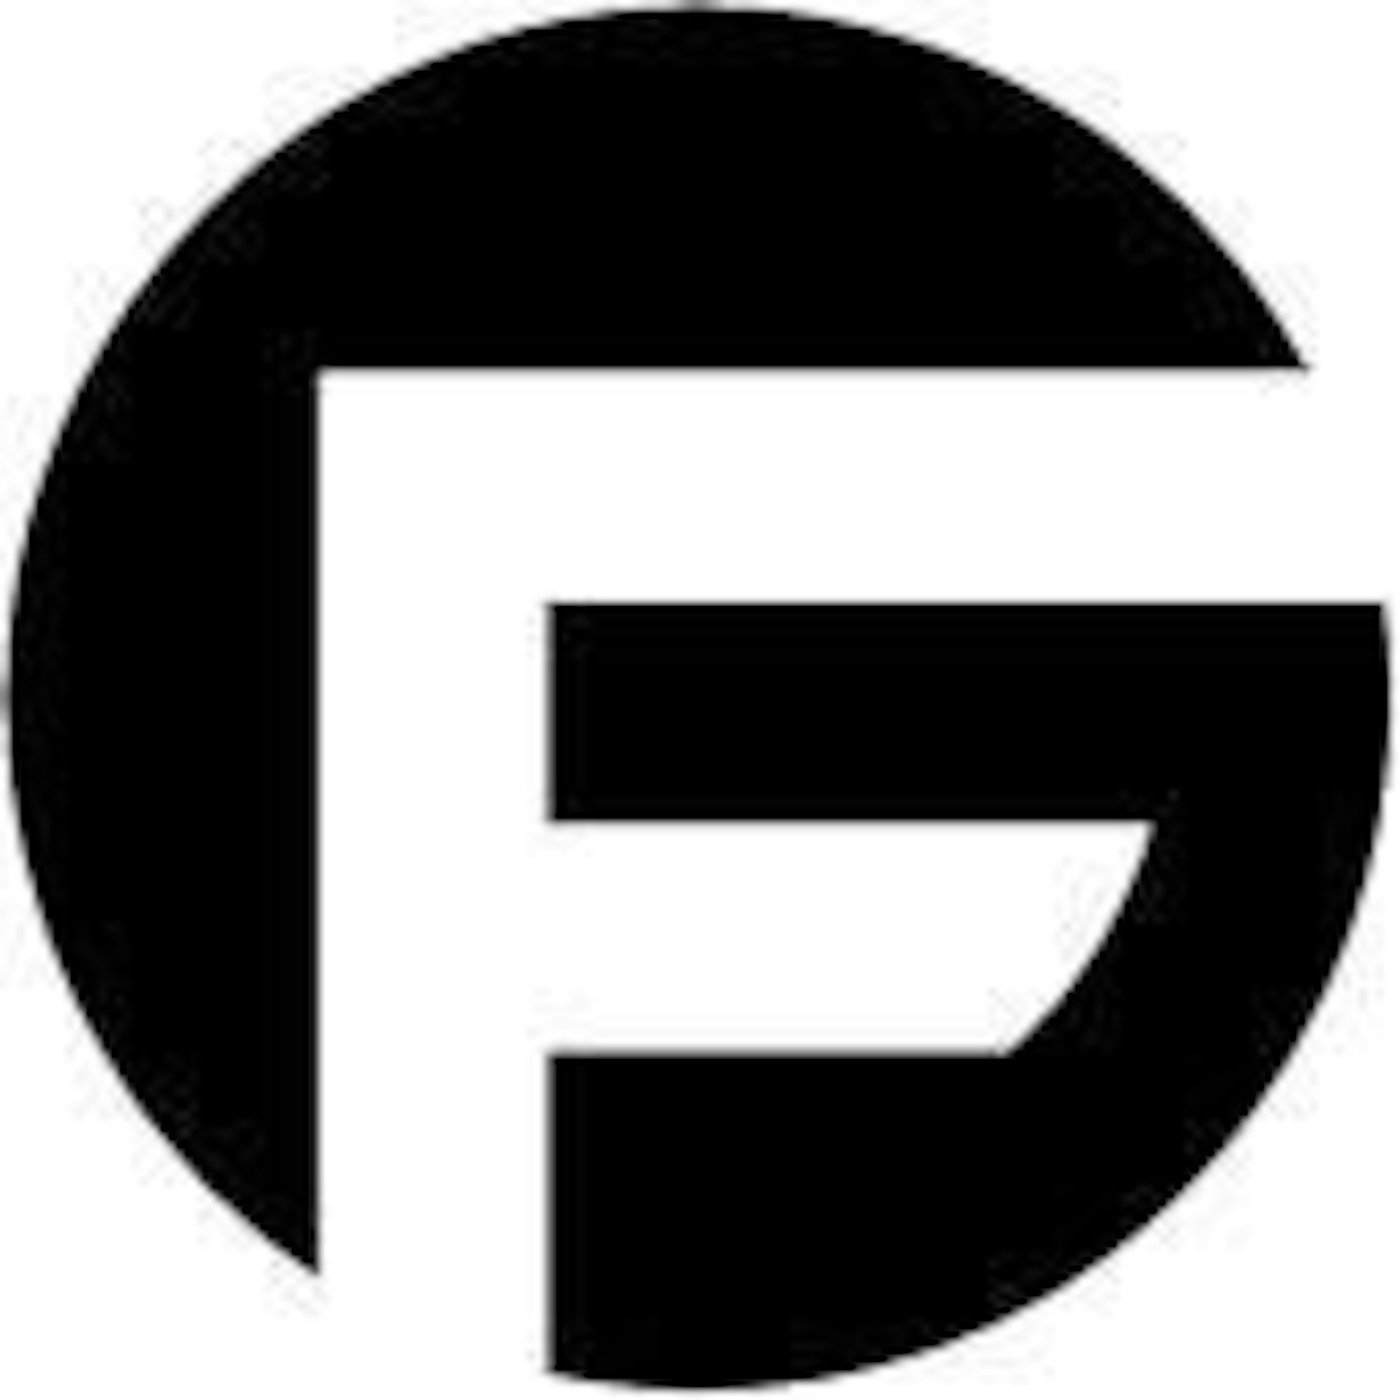 Faith Generations' Podcast